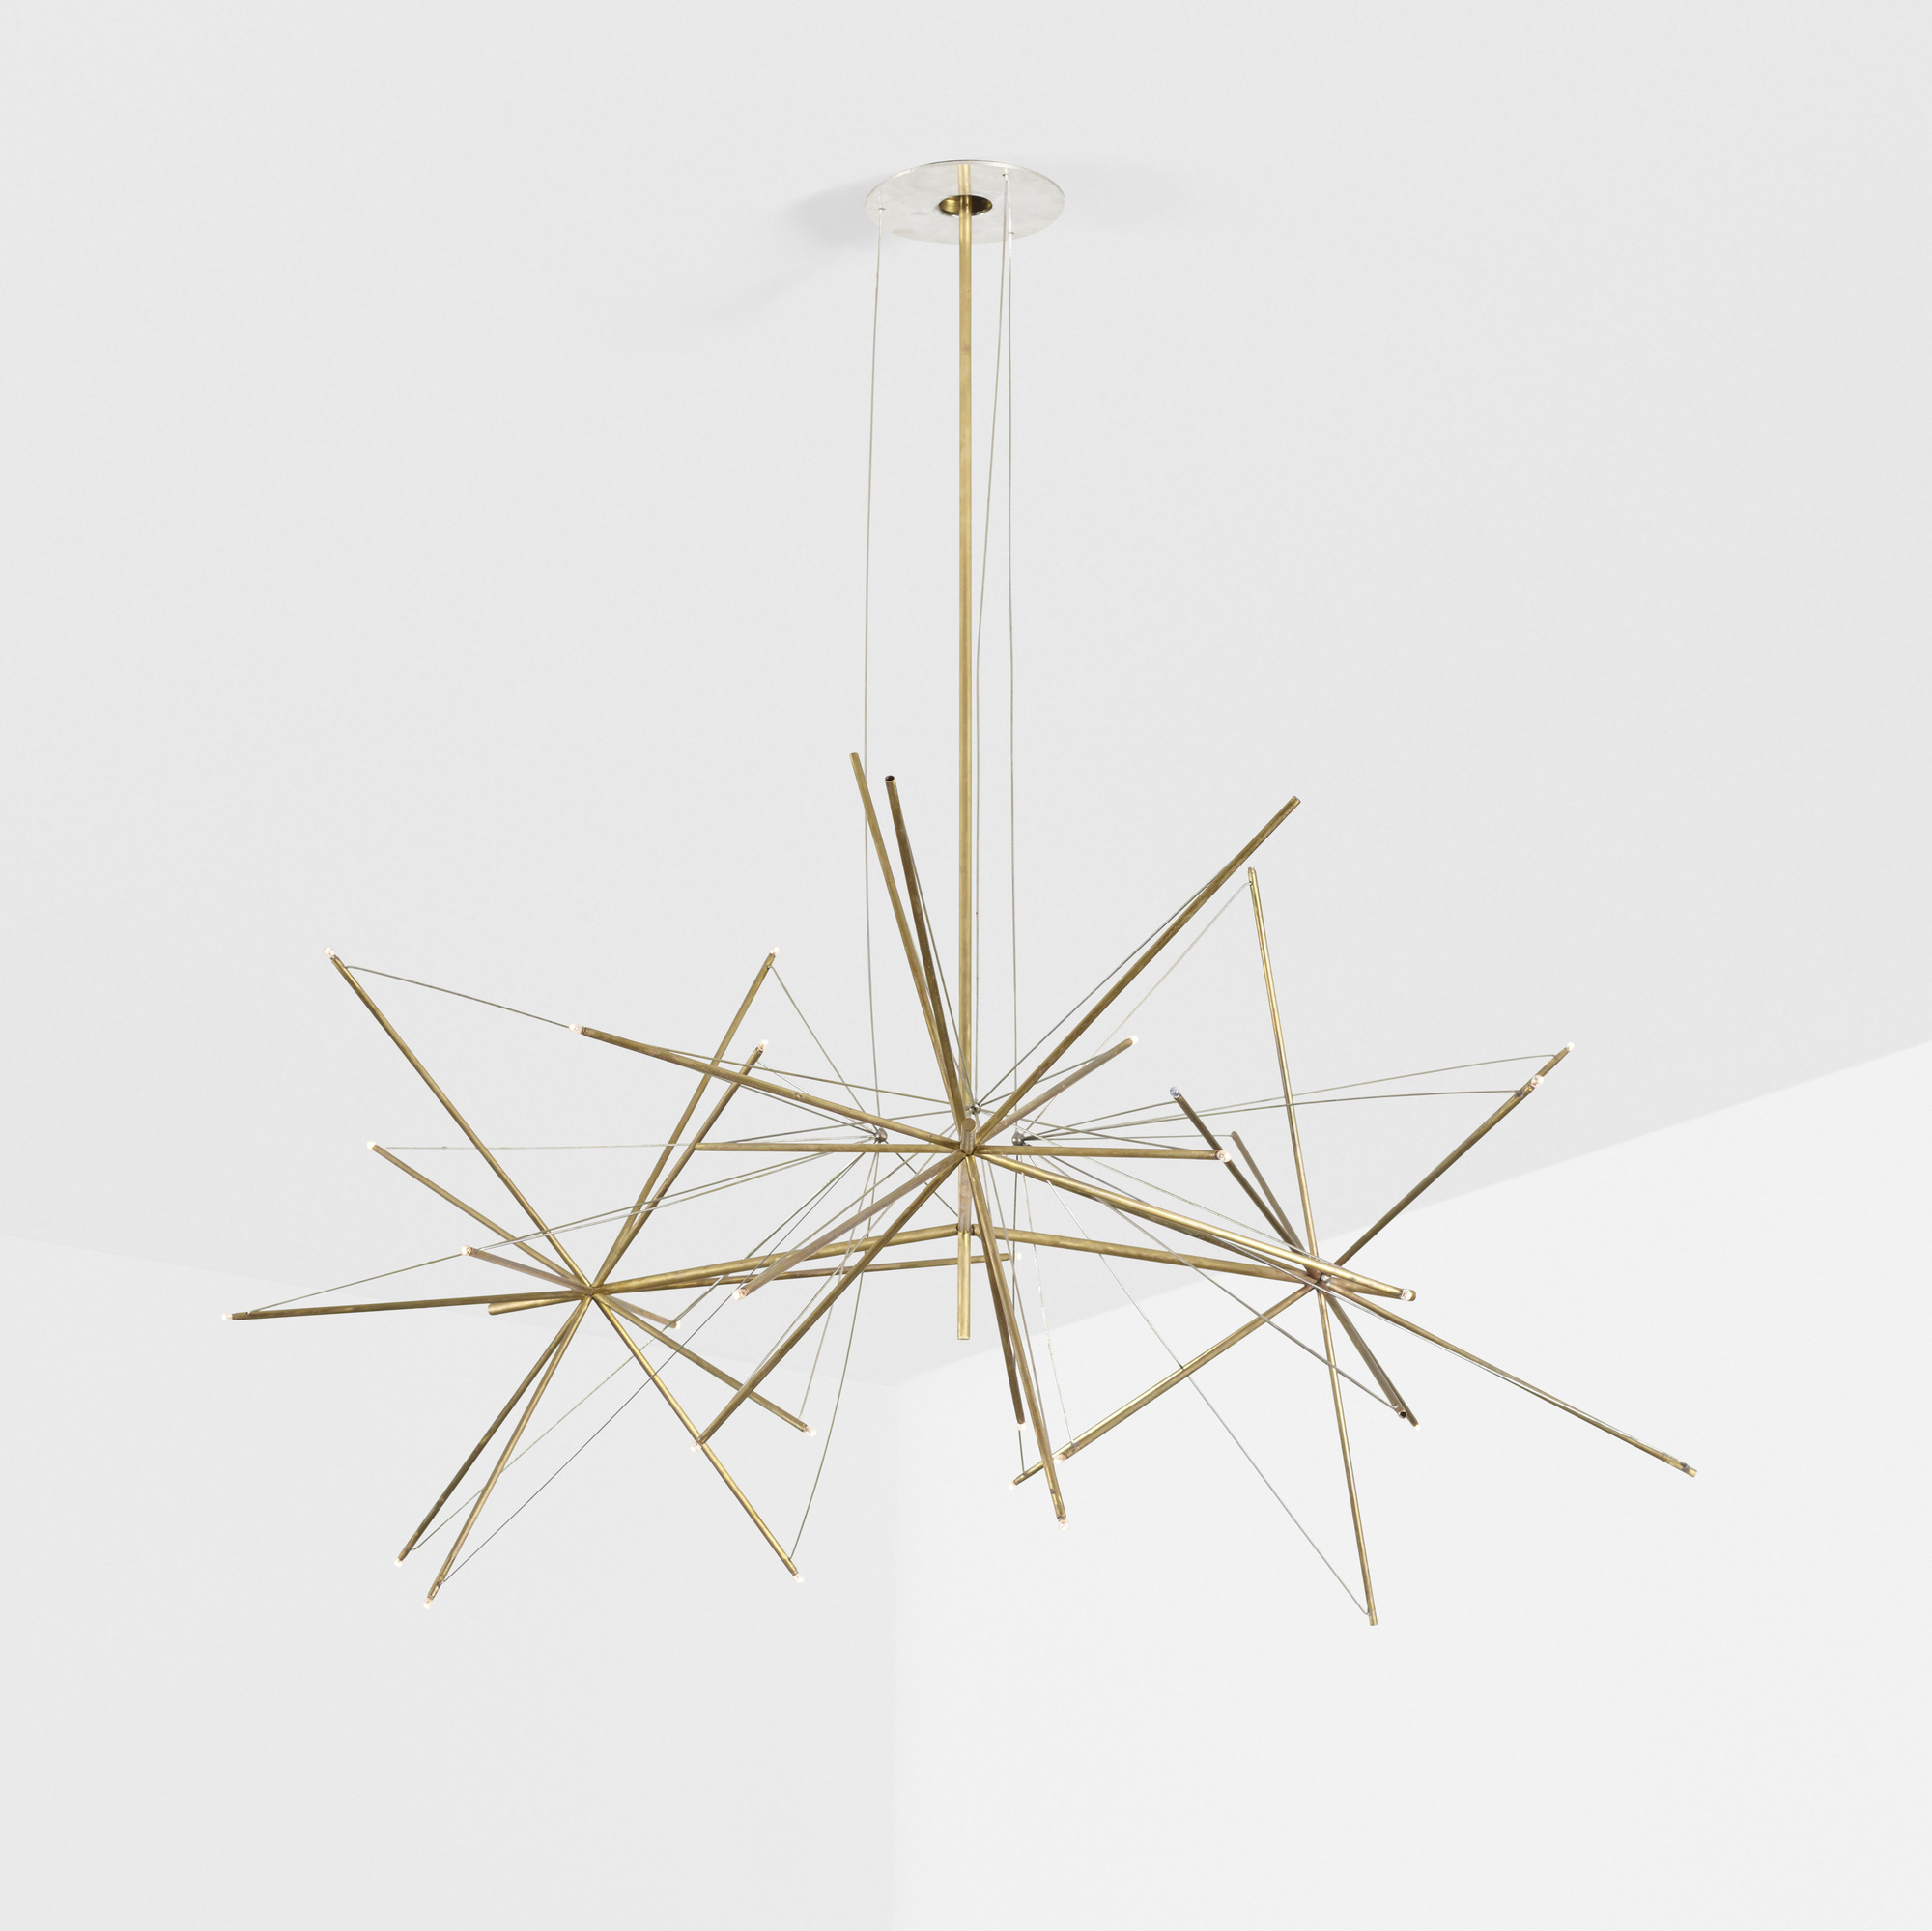 343: American / custom chandelier for the Washburn Residence (3 of 3)